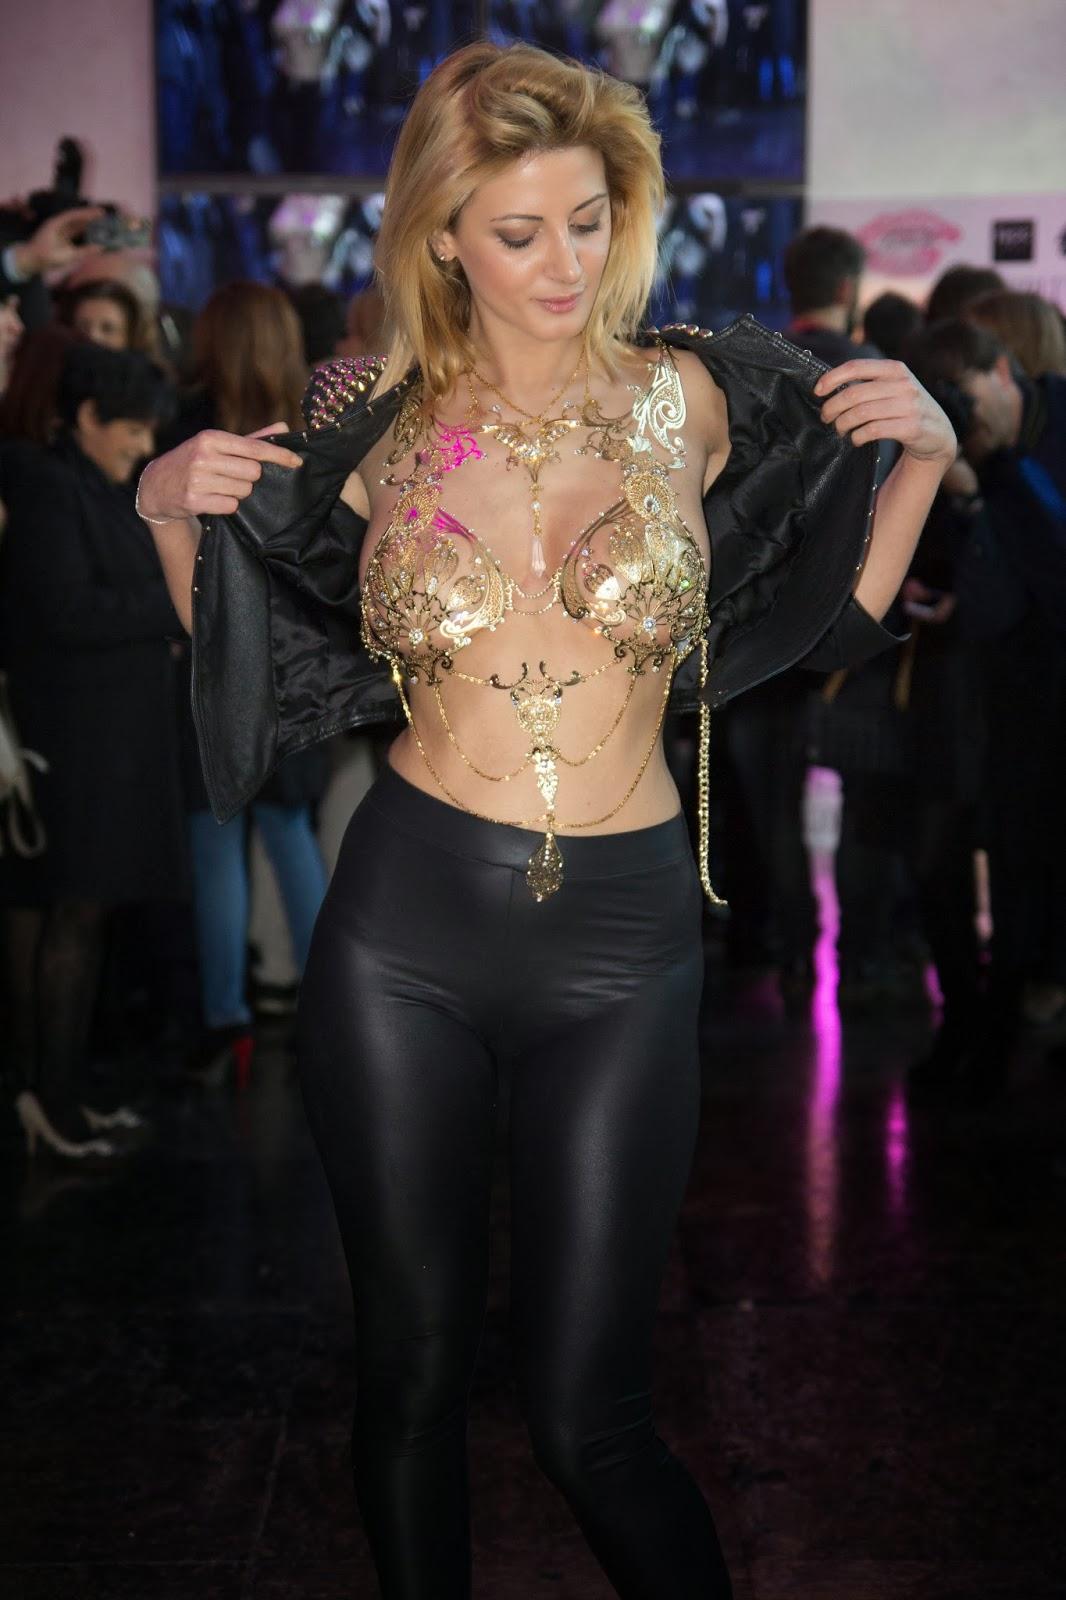 Feet Rosy Maggiulli naked (14 photos), Tits, Sideboobs, Selfie, butt 2015